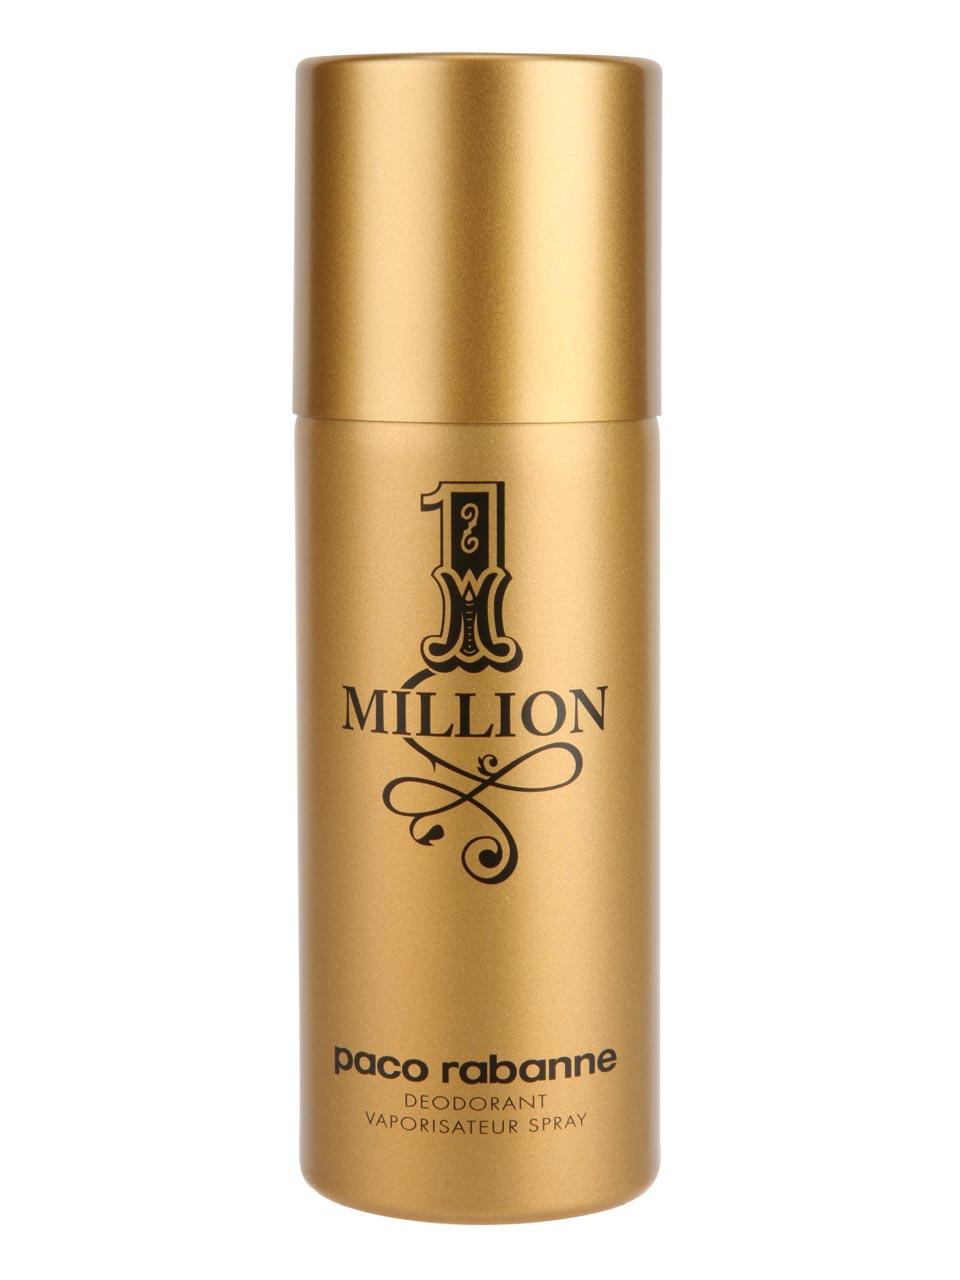 1 million deo spray